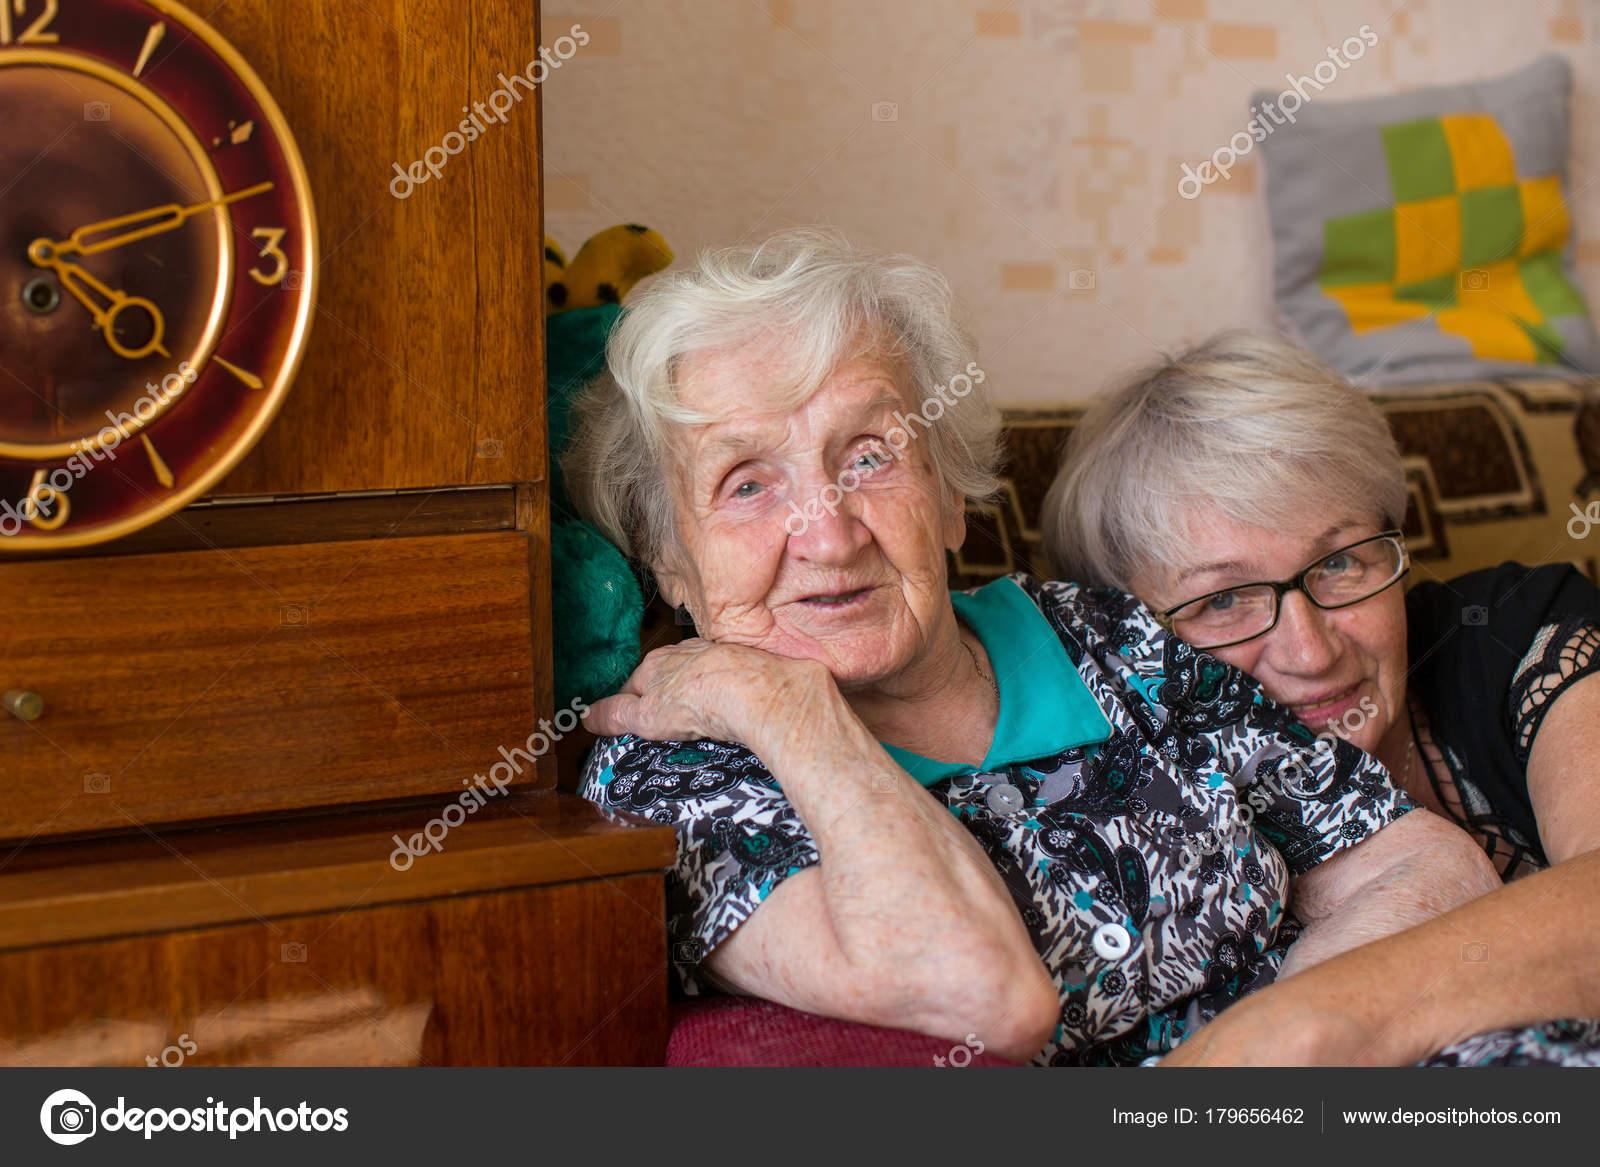 Old man sex video free